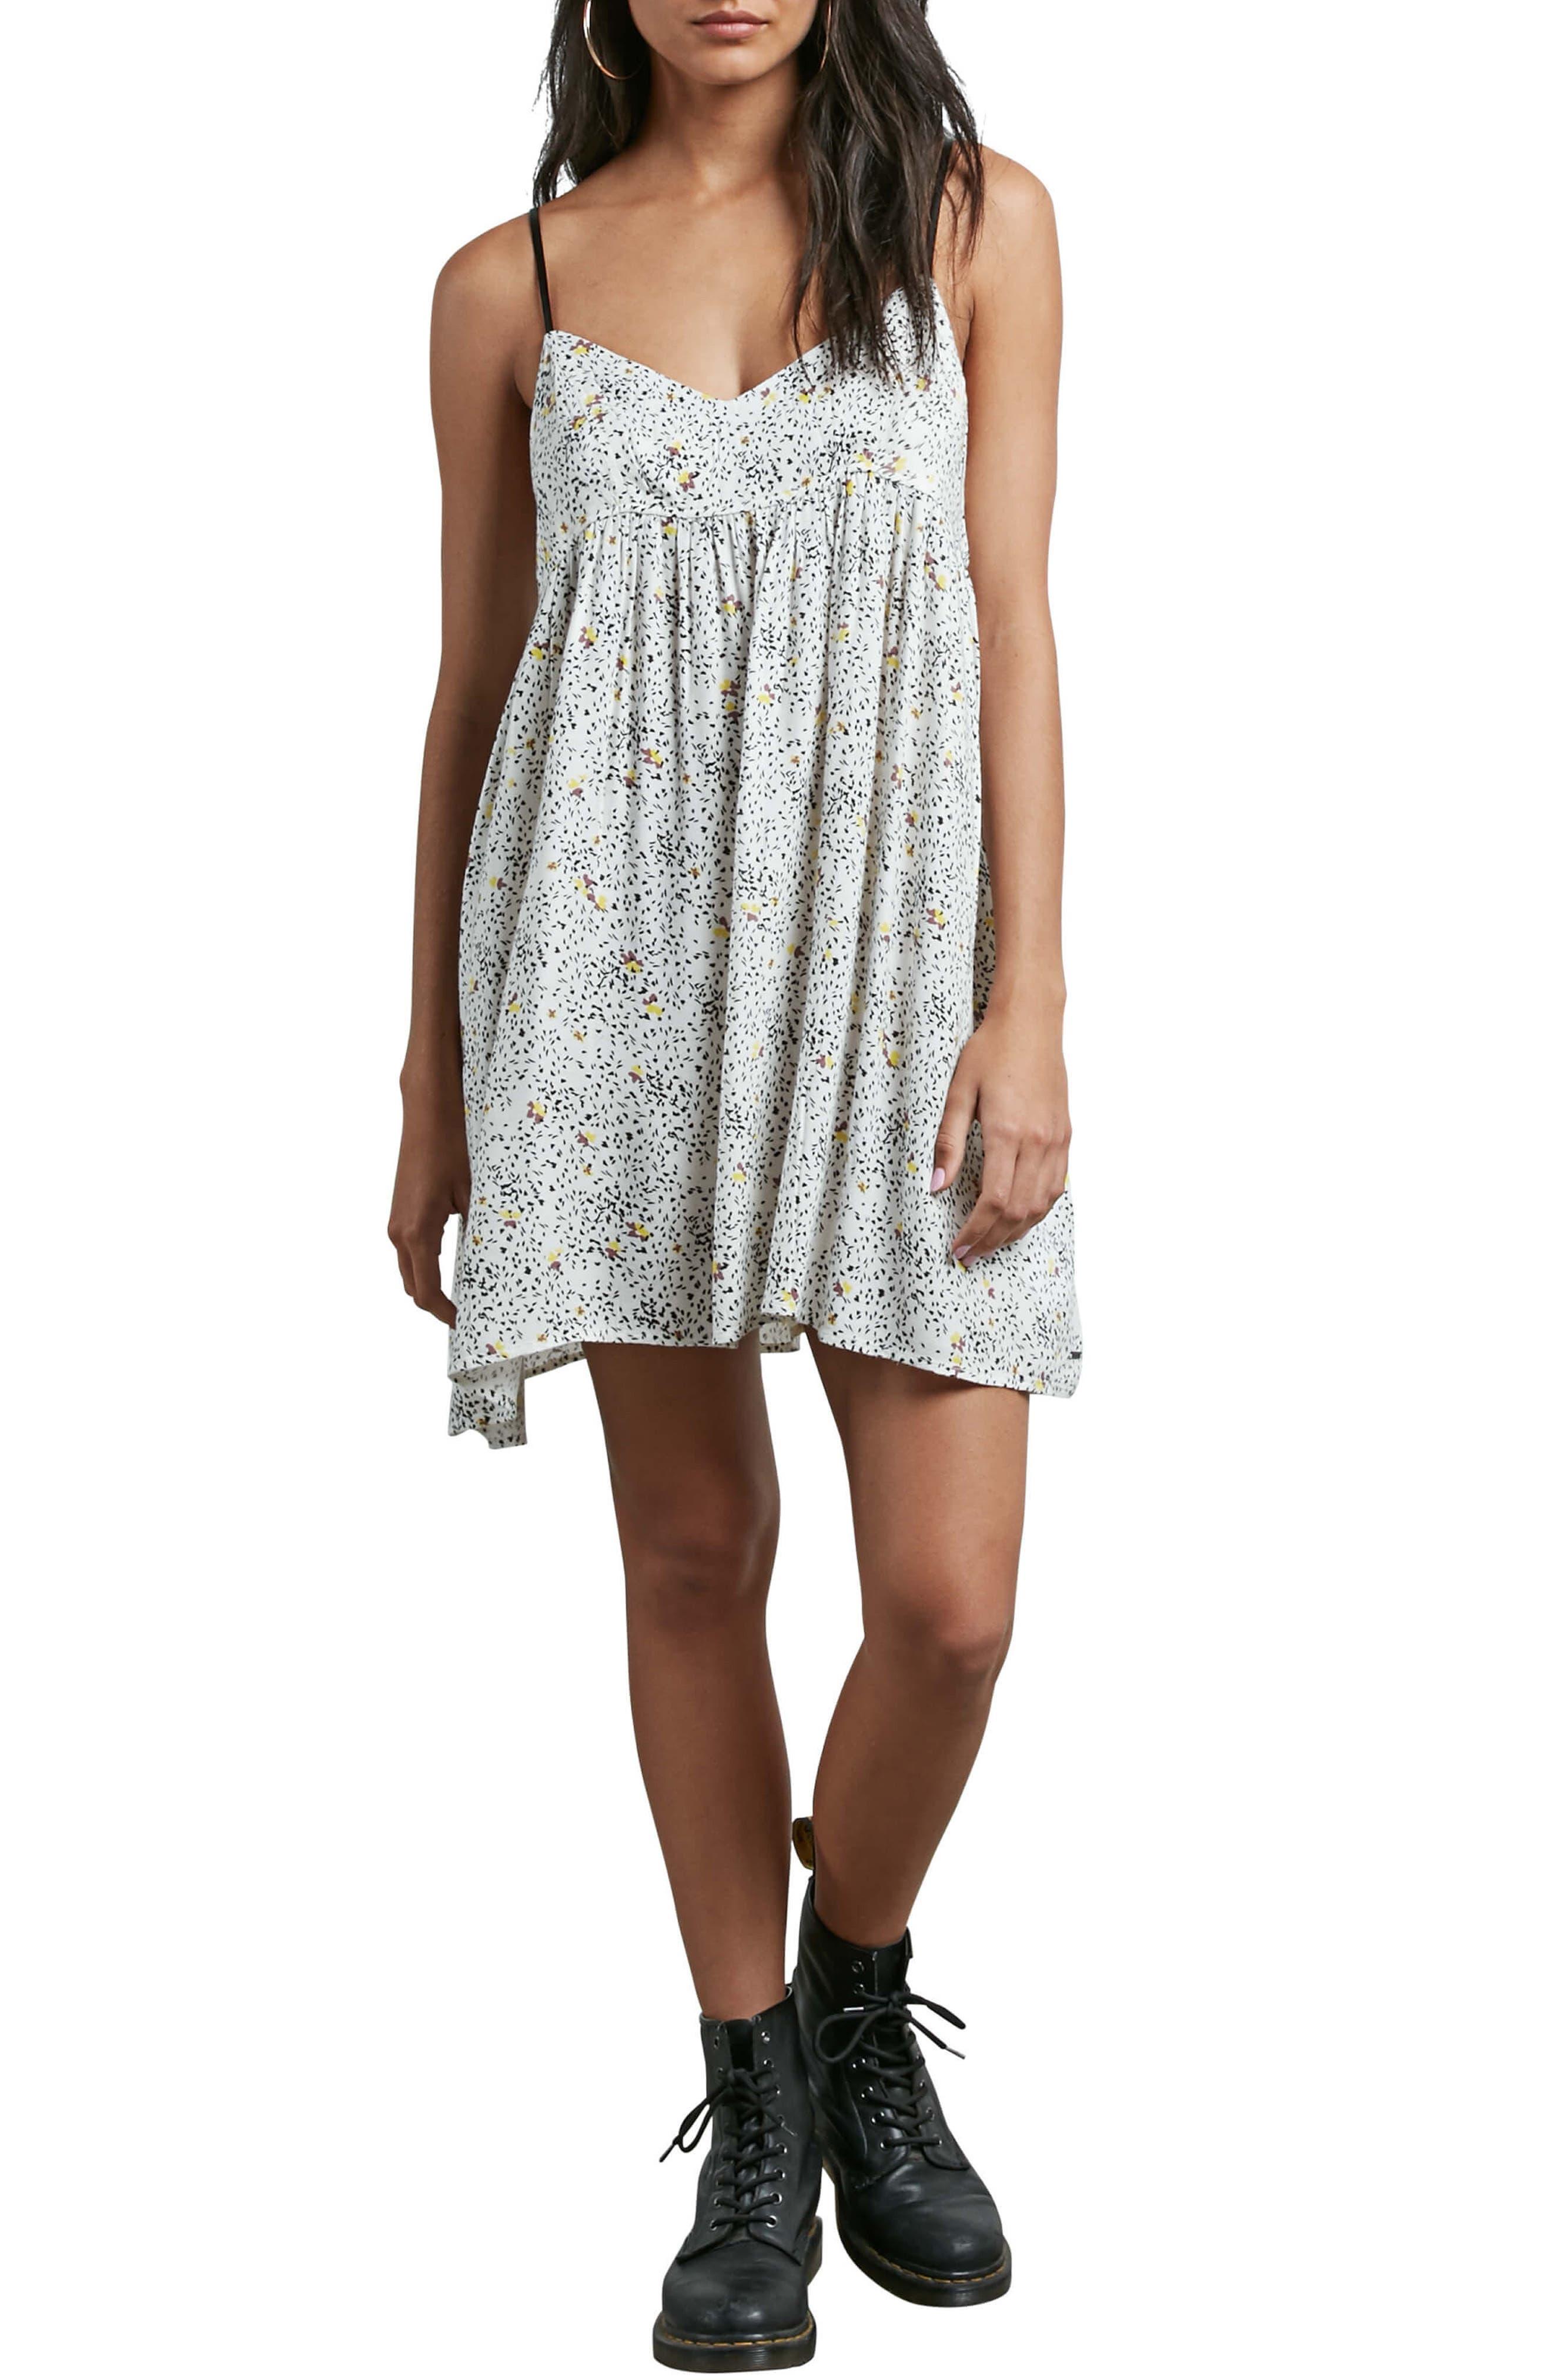 Main Image - Volcom Thx It's a New Dress Babydoll Dress